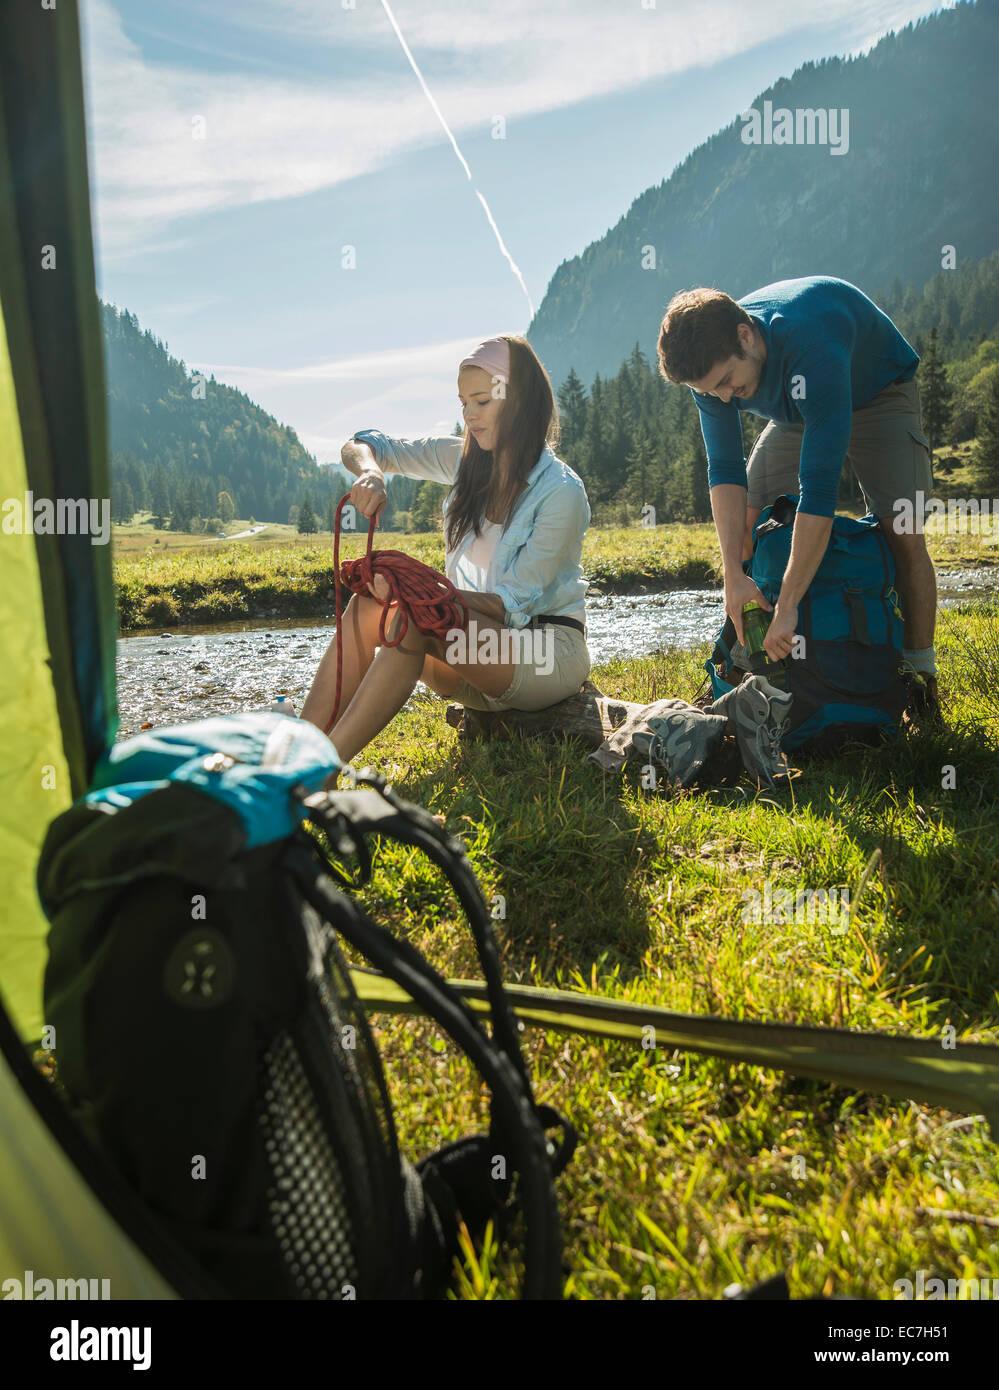 Österreich, Tirol, Tannheimer Tal, zwei junge Wanderer entspannend Stockbild